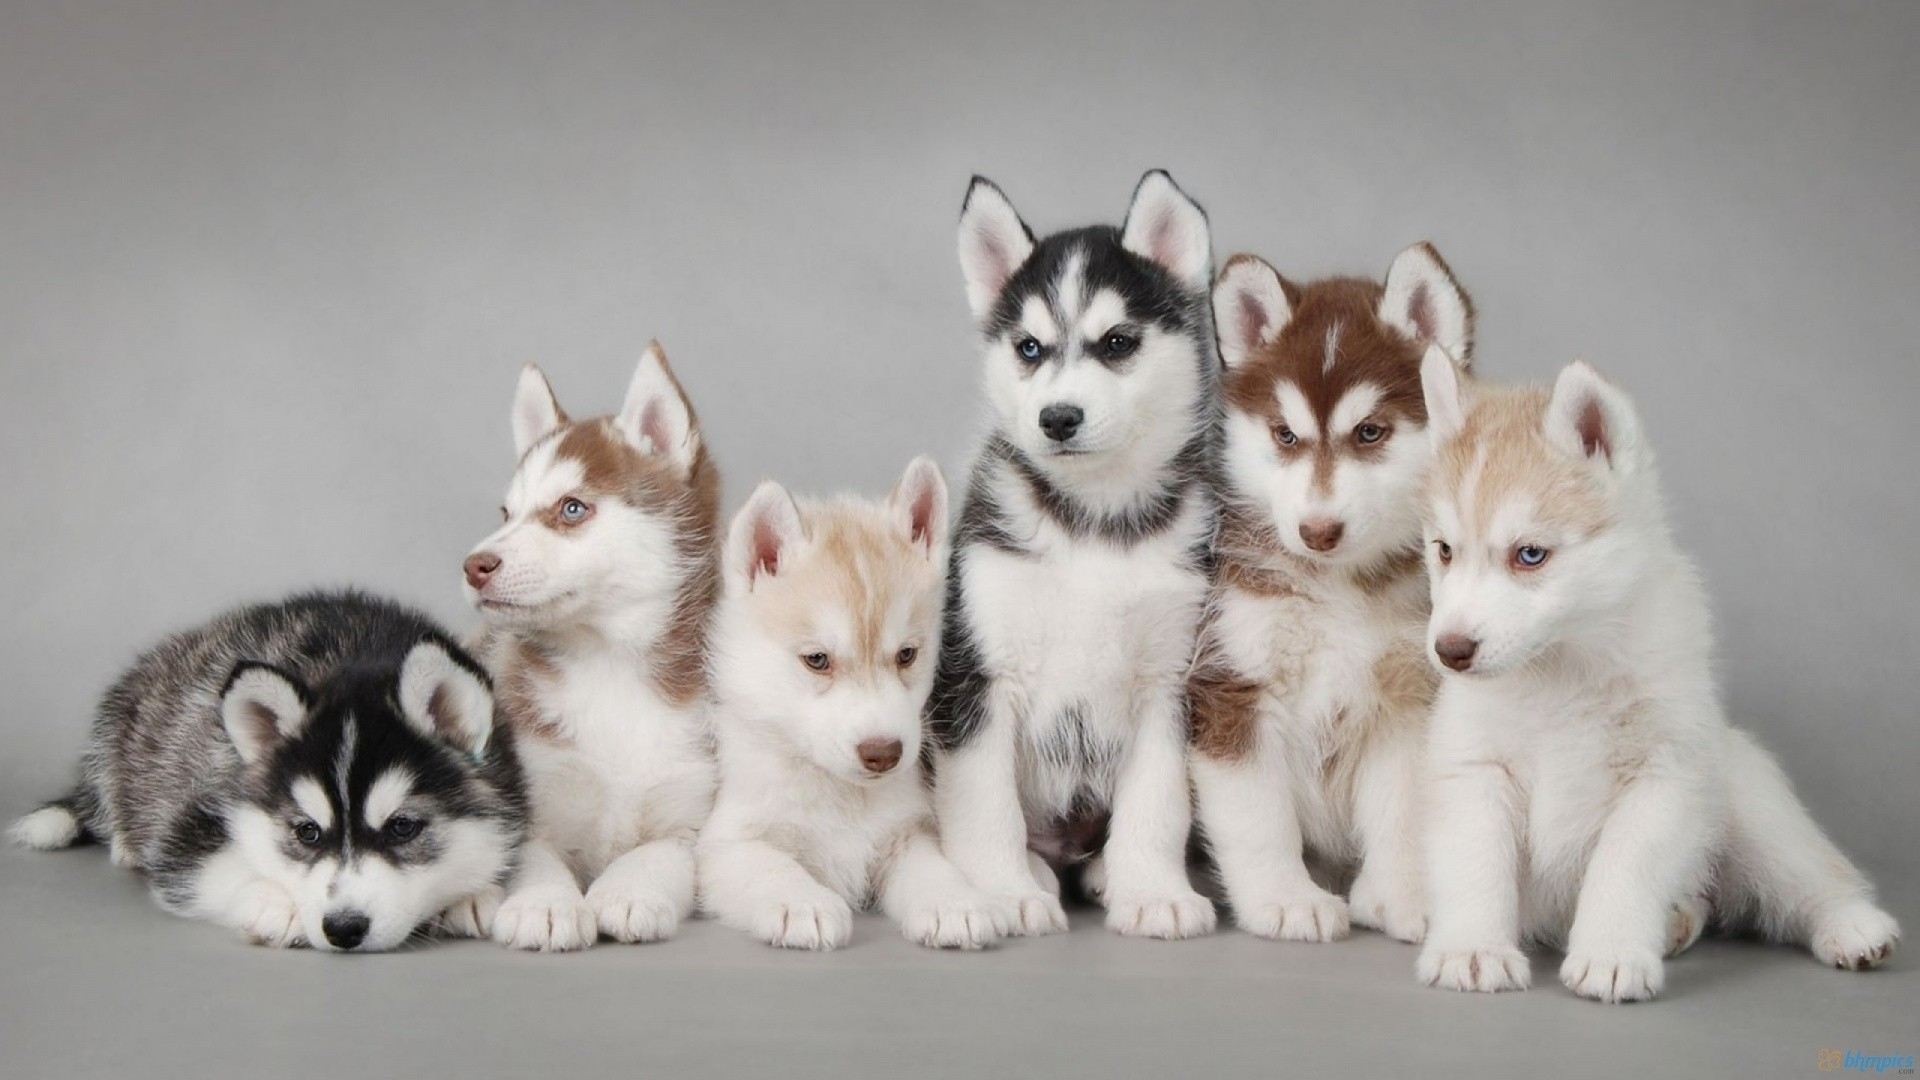 Desktop Wallpaper Puppies The Cutest Puppies | HD Wallpapers | Pinterest |  Hd wallpaper, Wallpaper and Wallpaper backgrounds